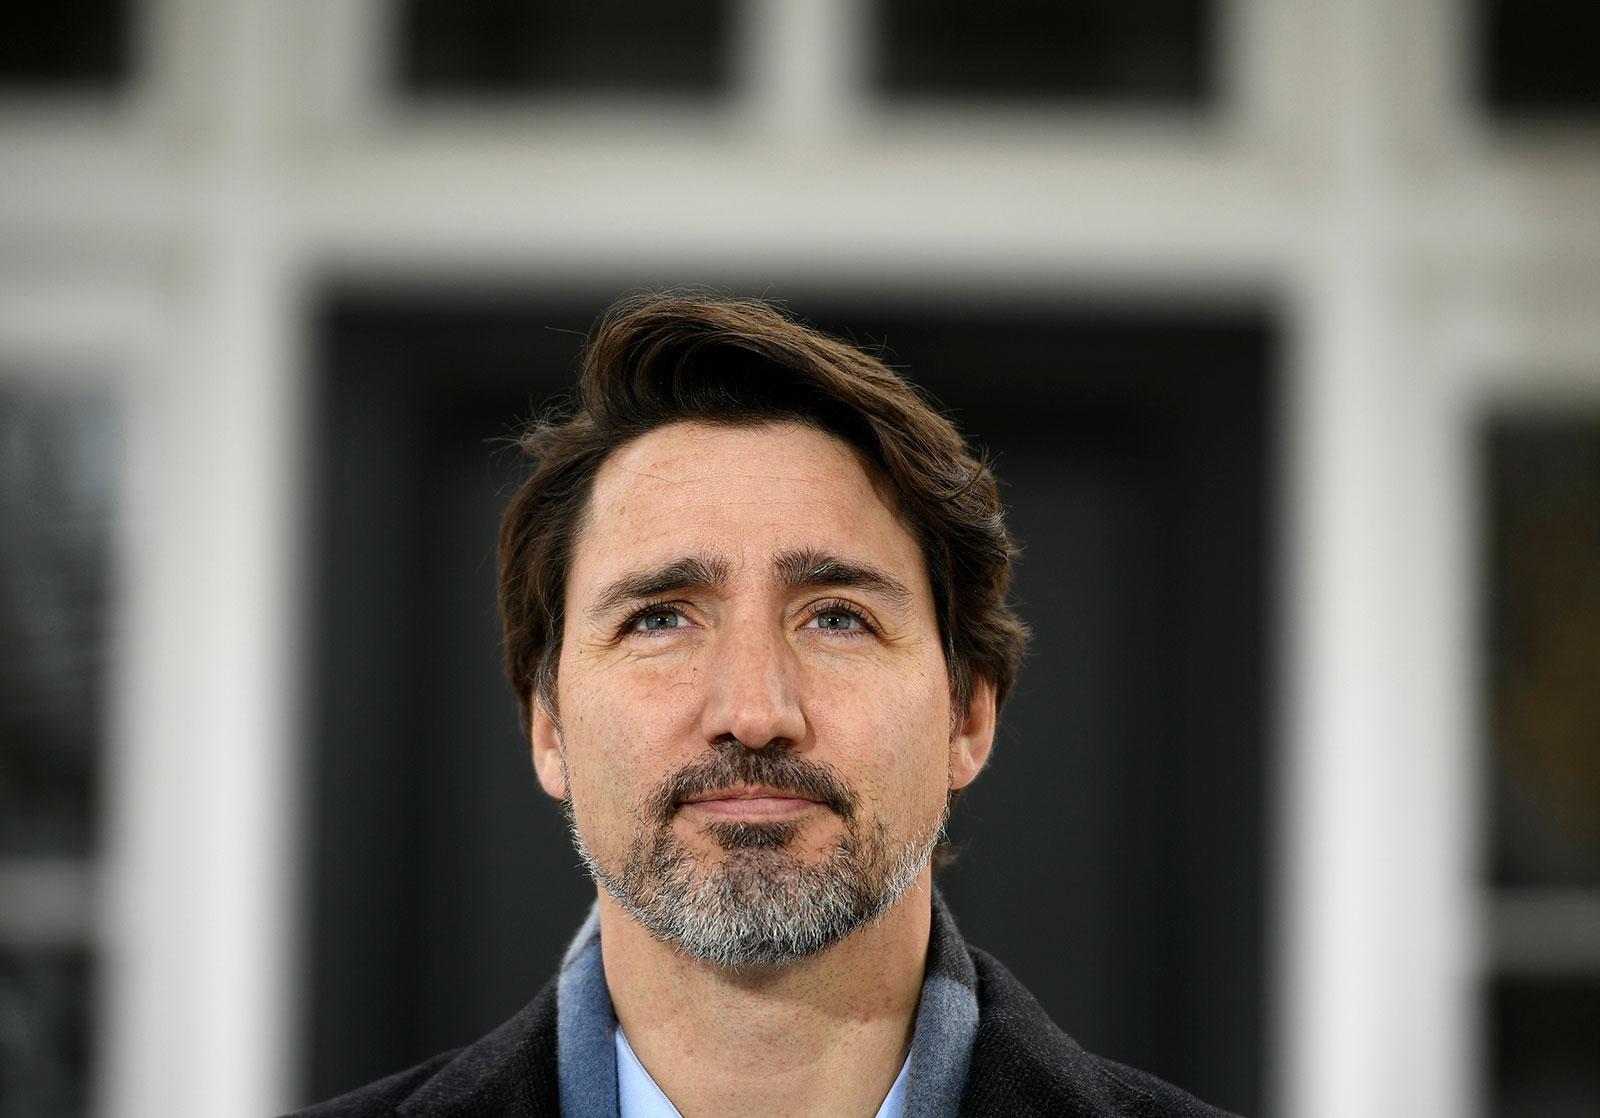 Justin Tang/The Canadian Press/AP